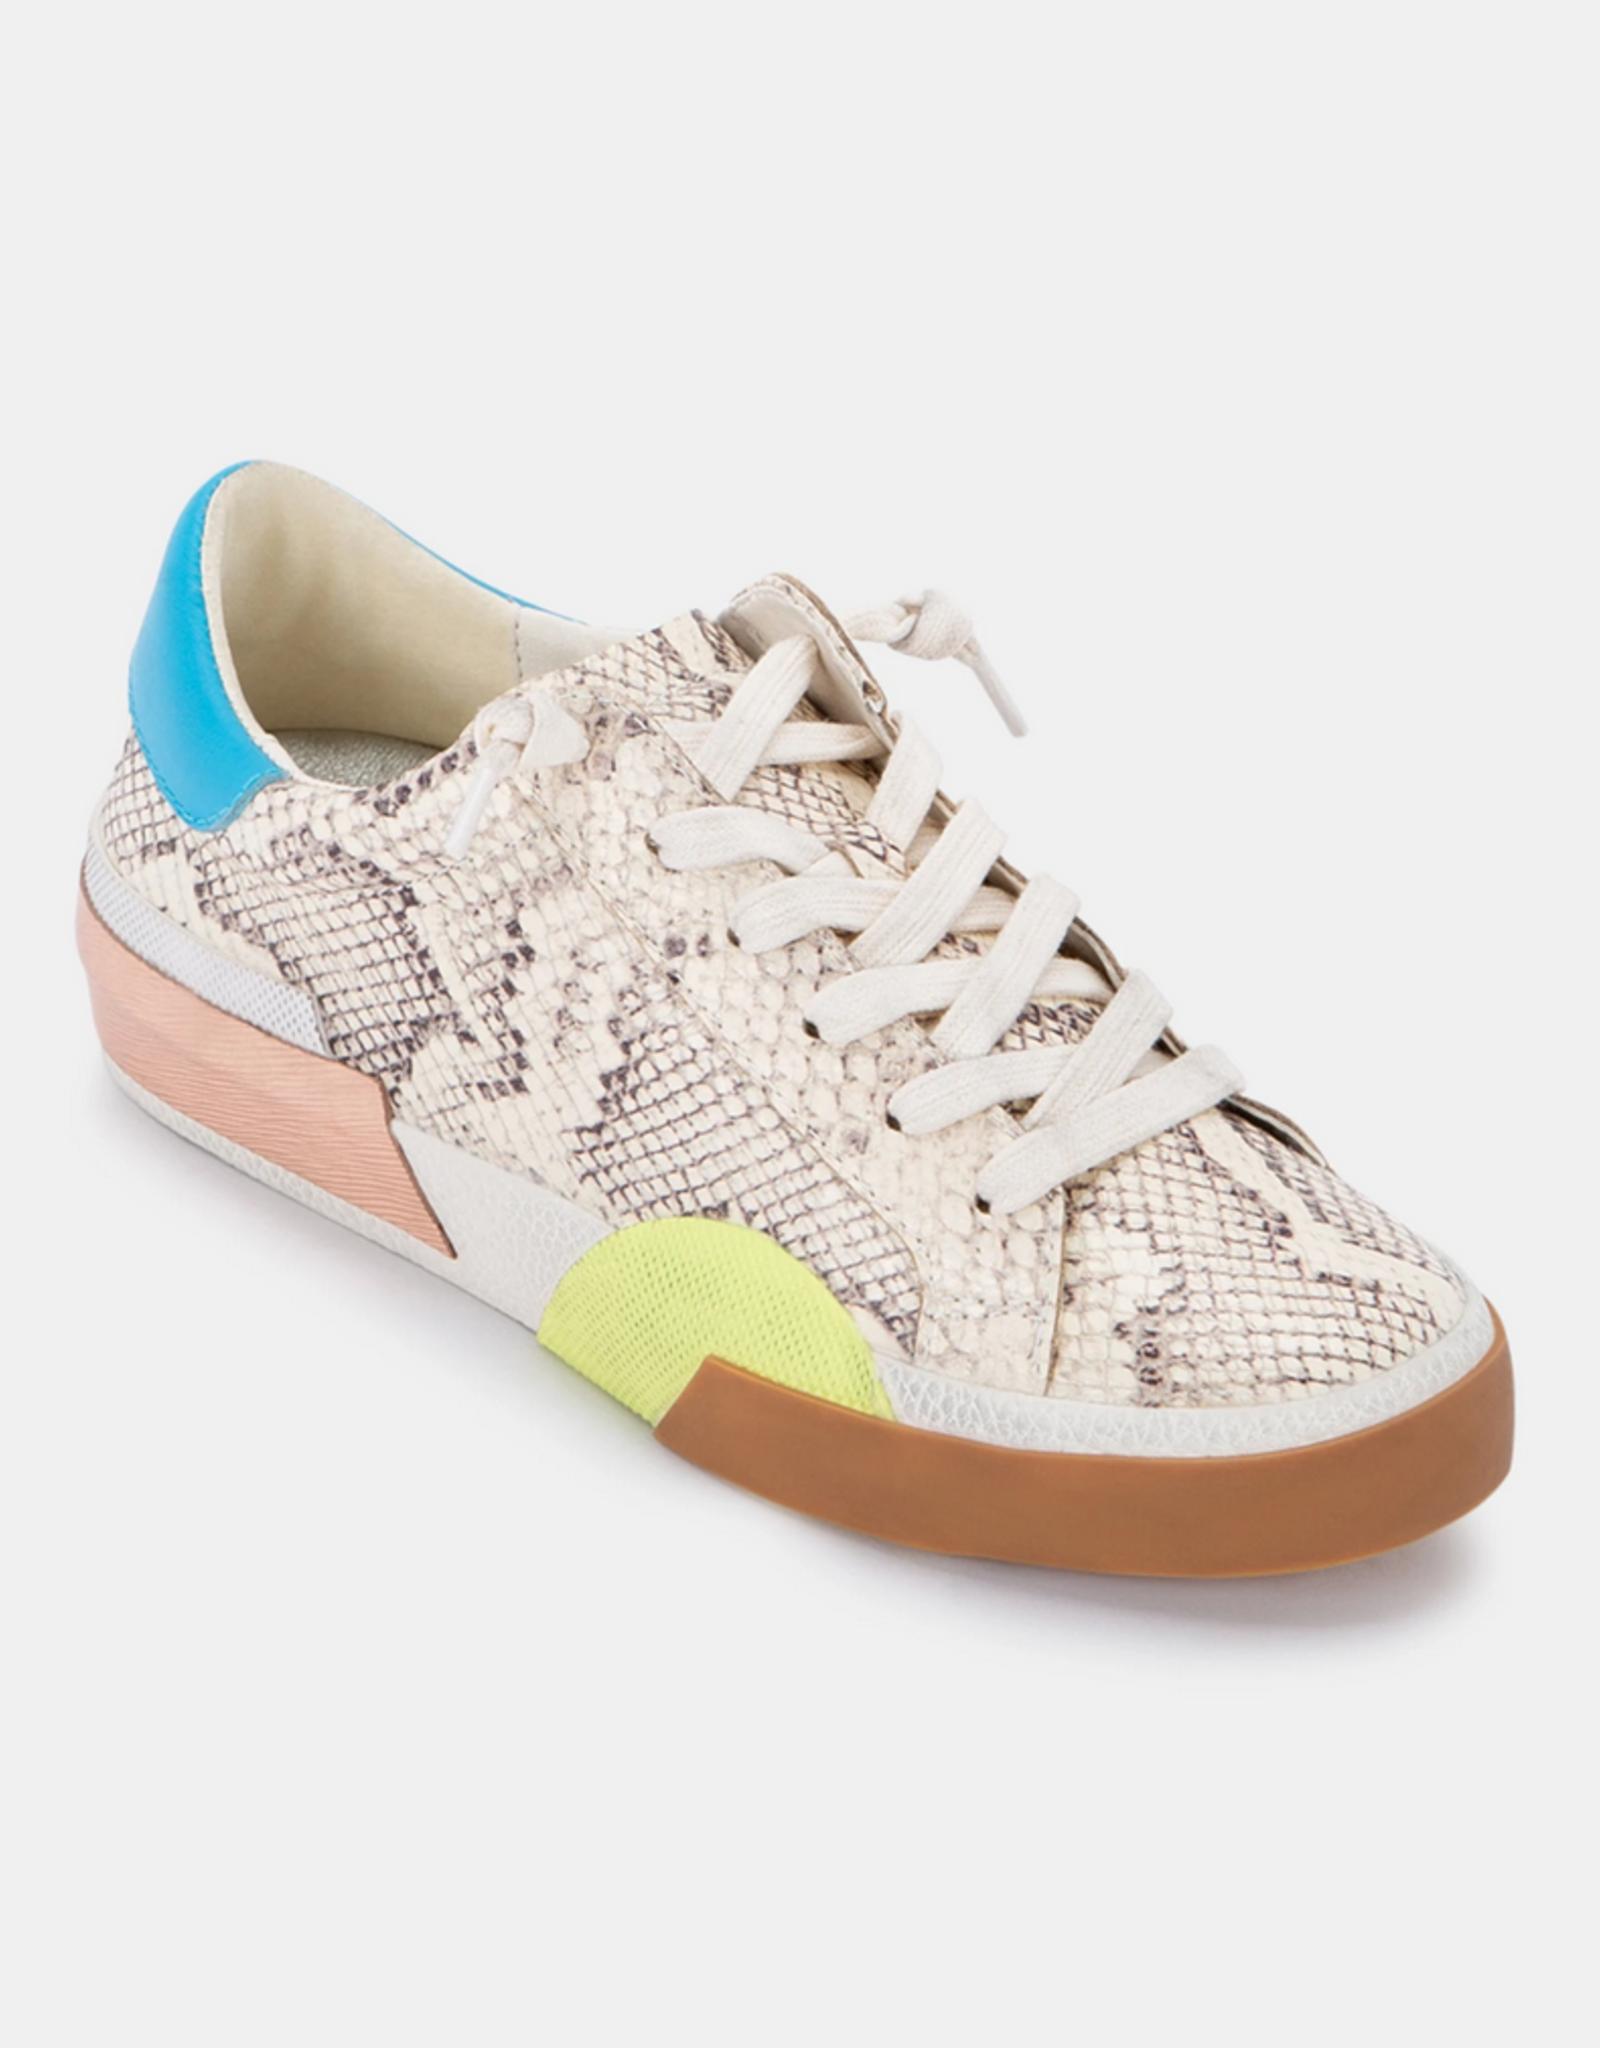 Dolce Vita Zina Sneakers